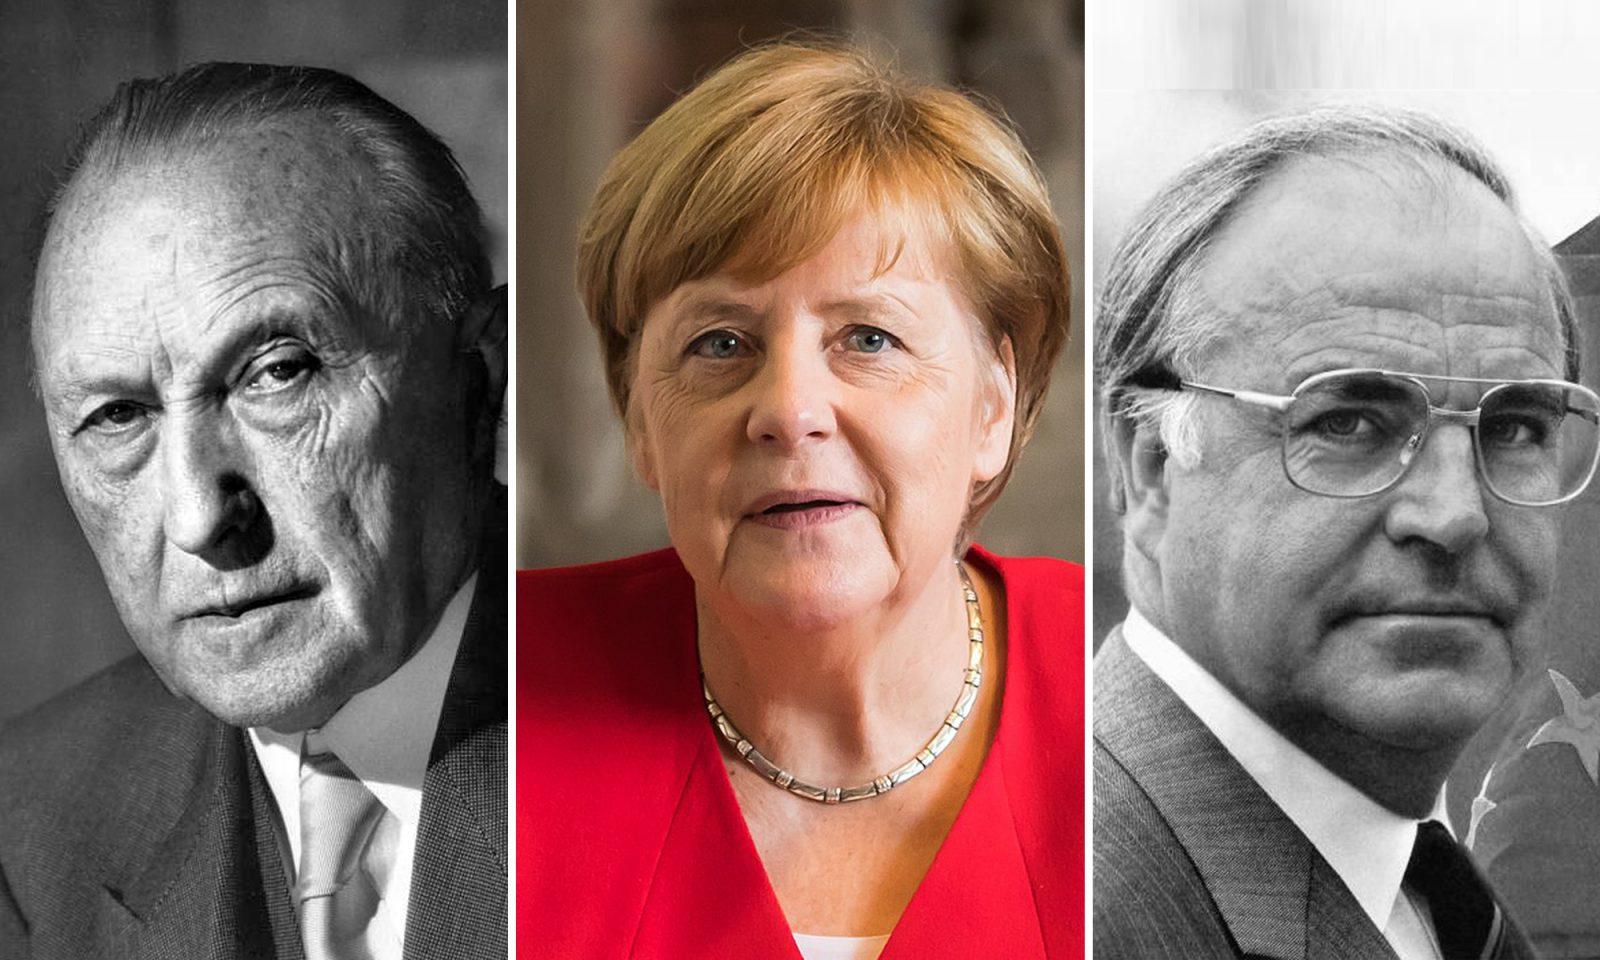 Konrad Adenauer, Angela Merkel, Helmut Kohl Foto: Bundesarchiv, B 145 Bild-F078072-0004 / Katherine Young / CC BY-SA 3.0 DE / Wikimedia.org/Konrad-Adenauer-Stiftung/CC3.0 / Raimond Spekking / CC BY-SA 4.0 / JF-Montage